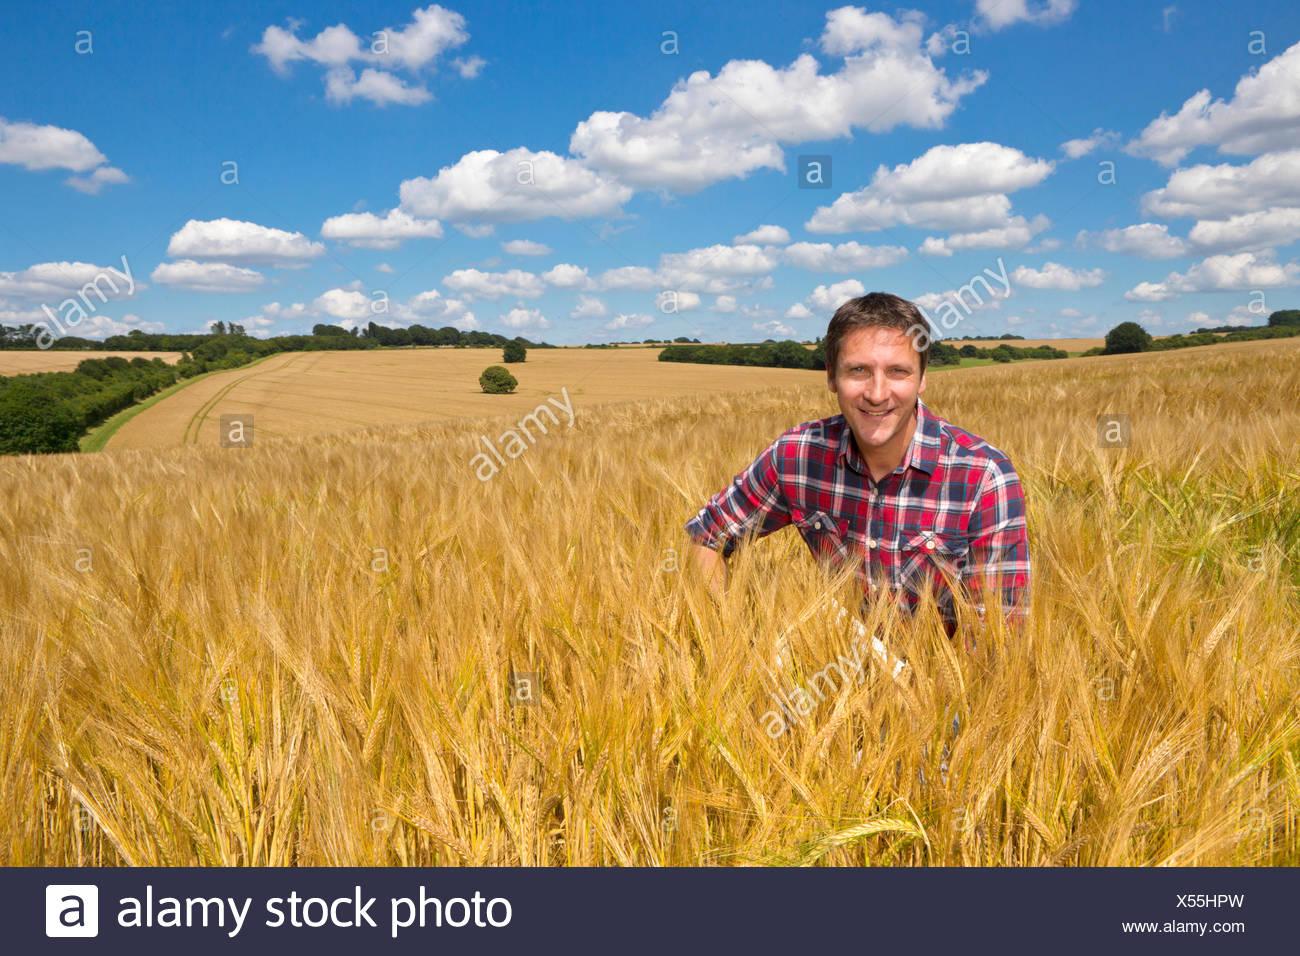 Portrait smiling farmer in sunny rural barley crop field in summer - Stock Image